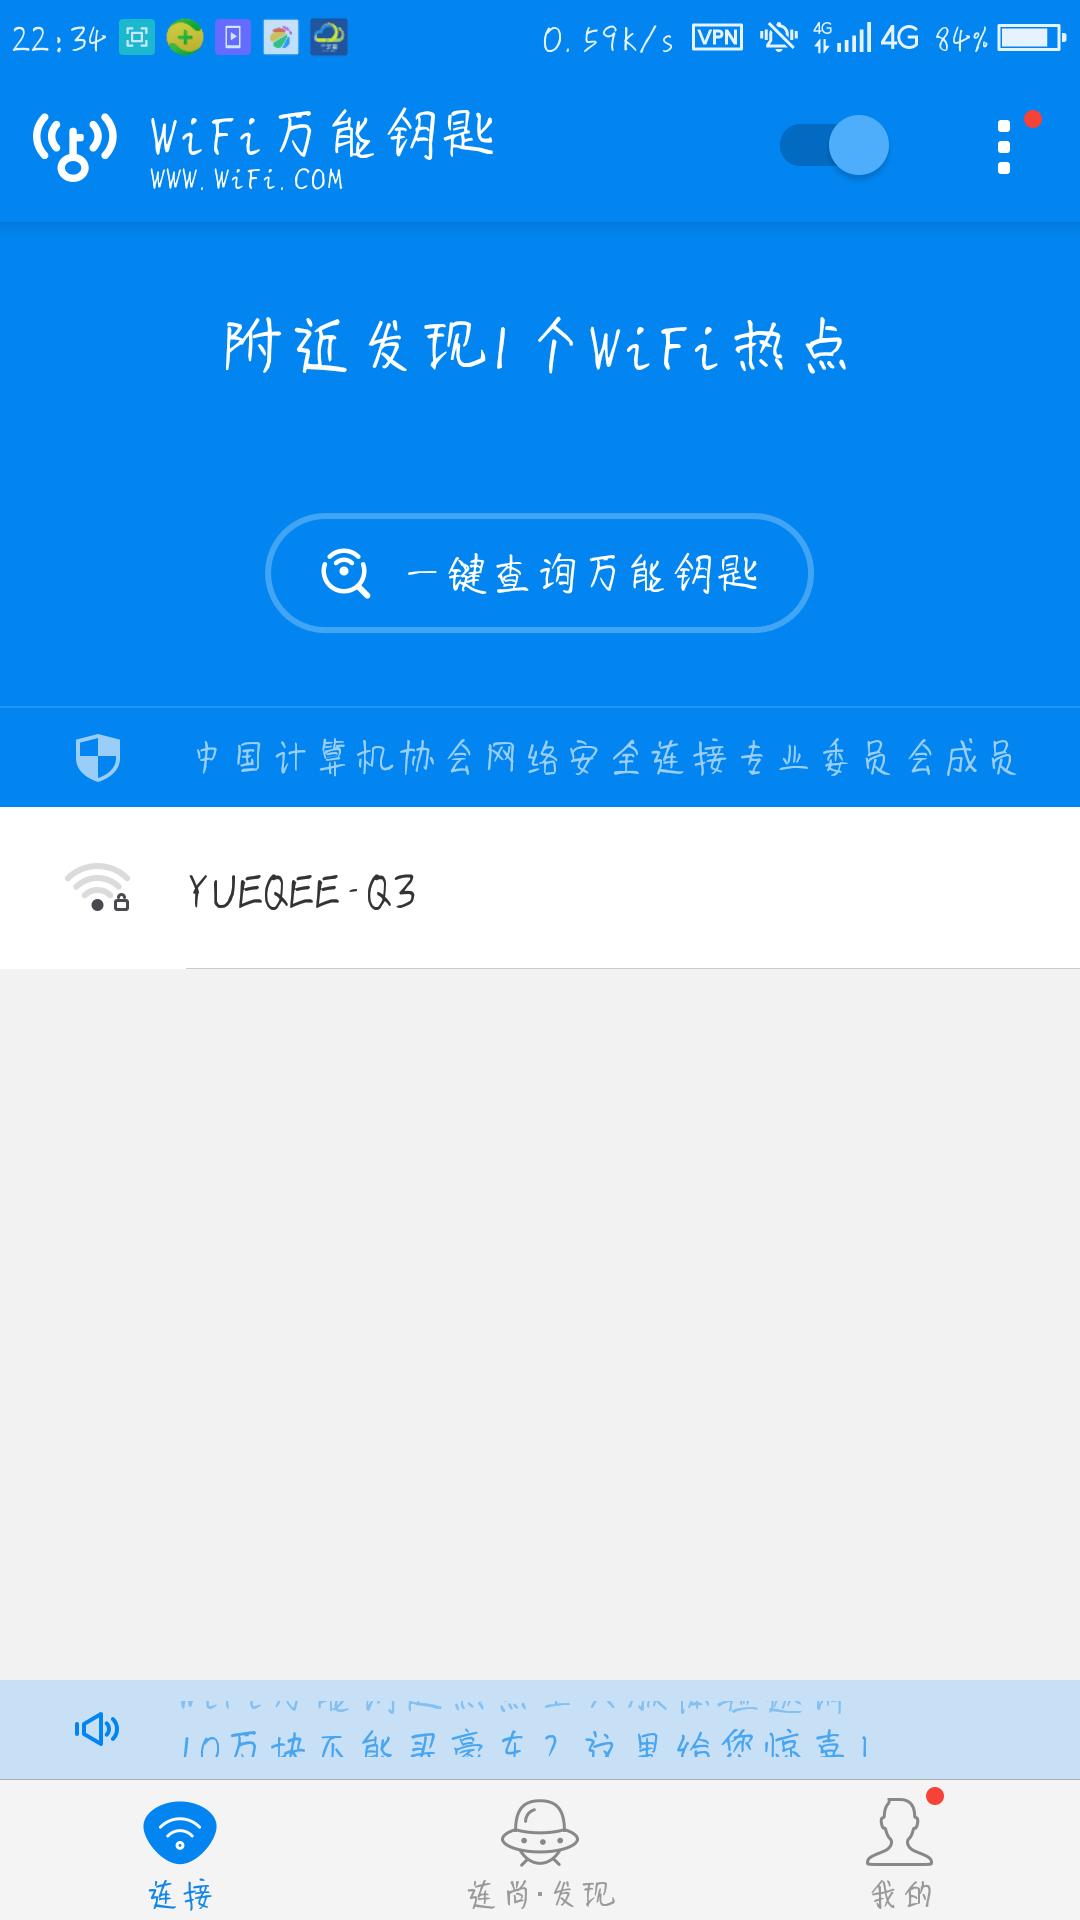 Screenshot_2016-10-23-22-34-34.png